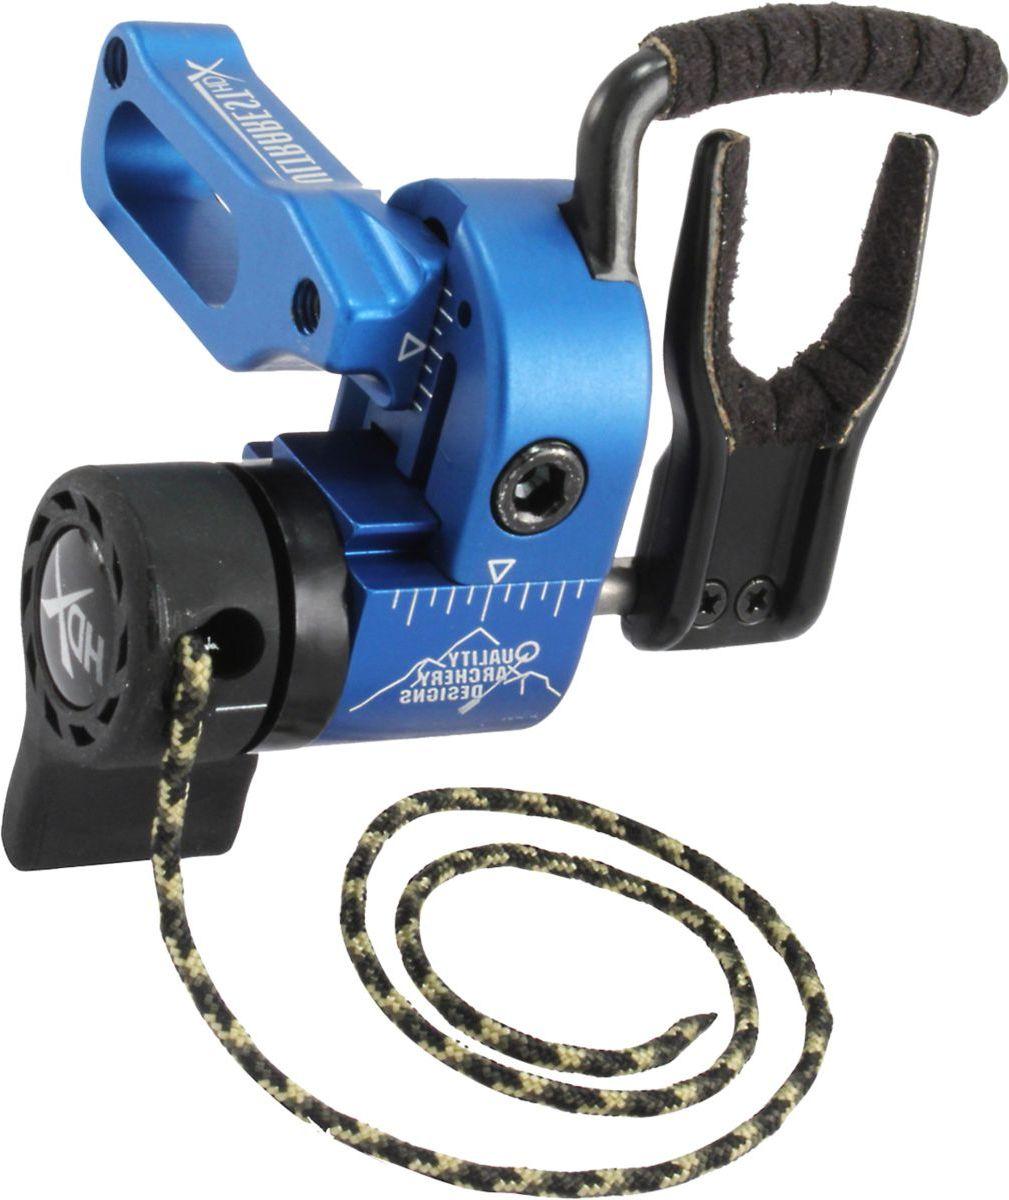 QAD Ultra-Rest HDX Arrow Rest – Blue